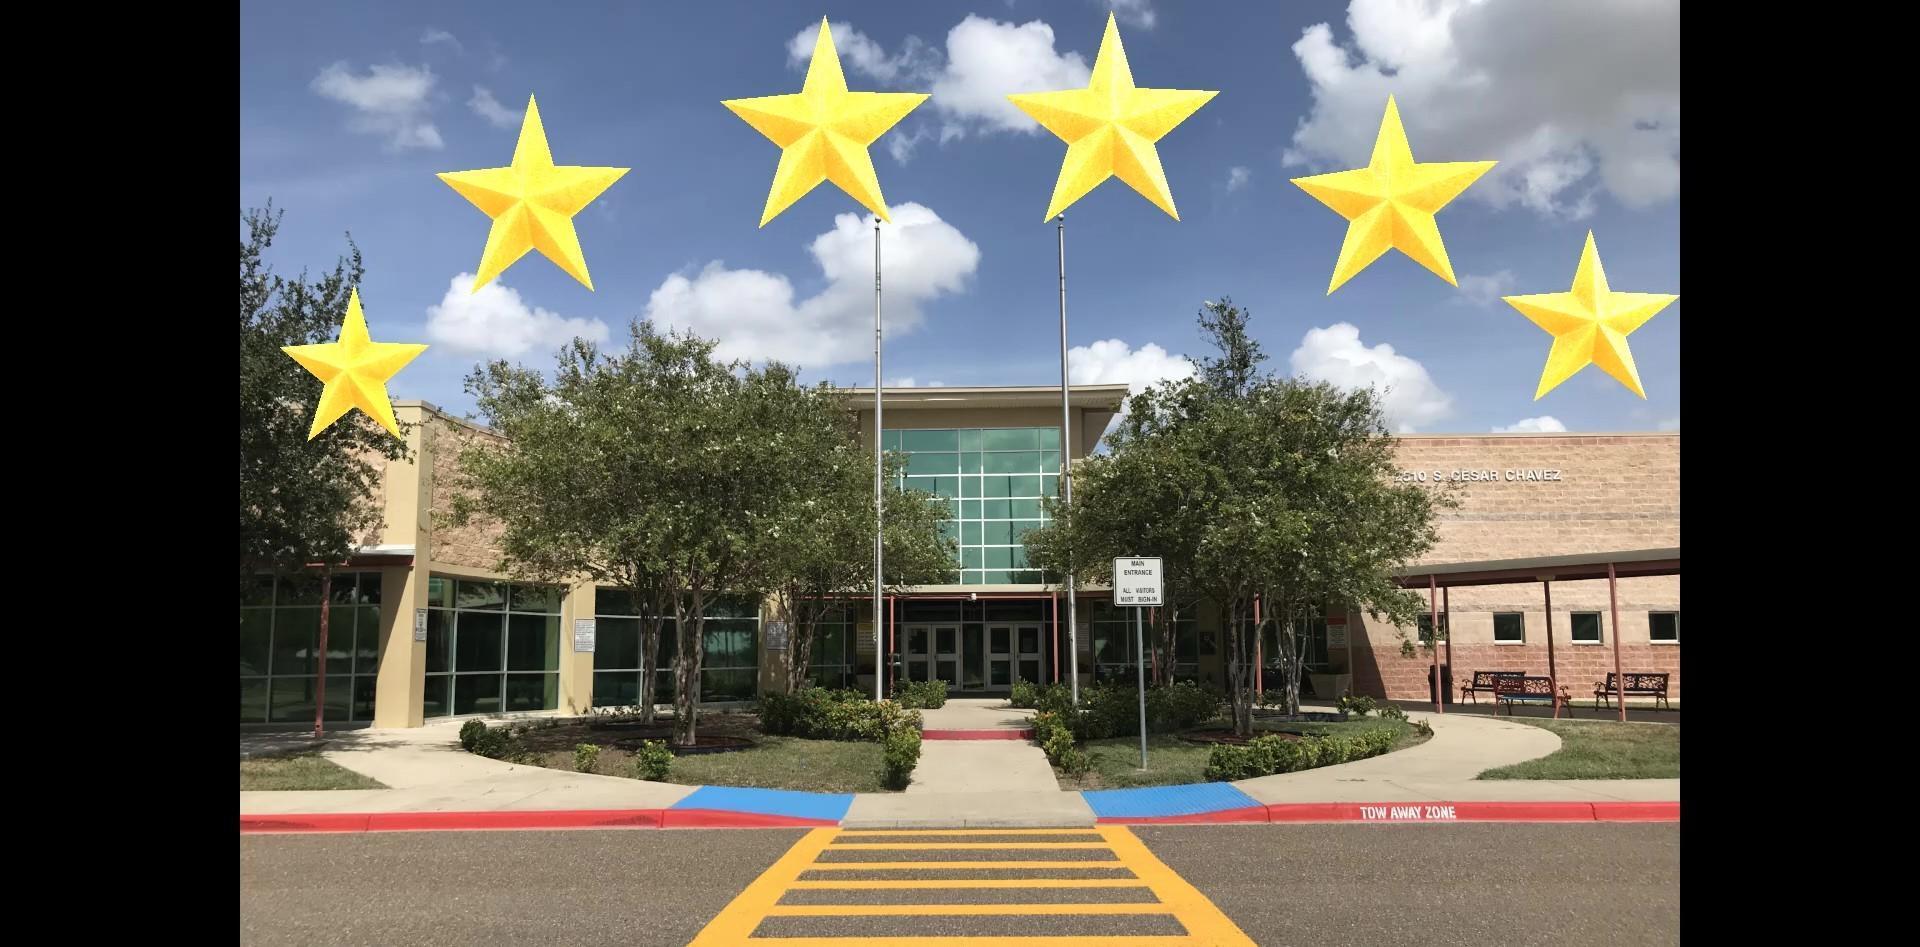 6 star school